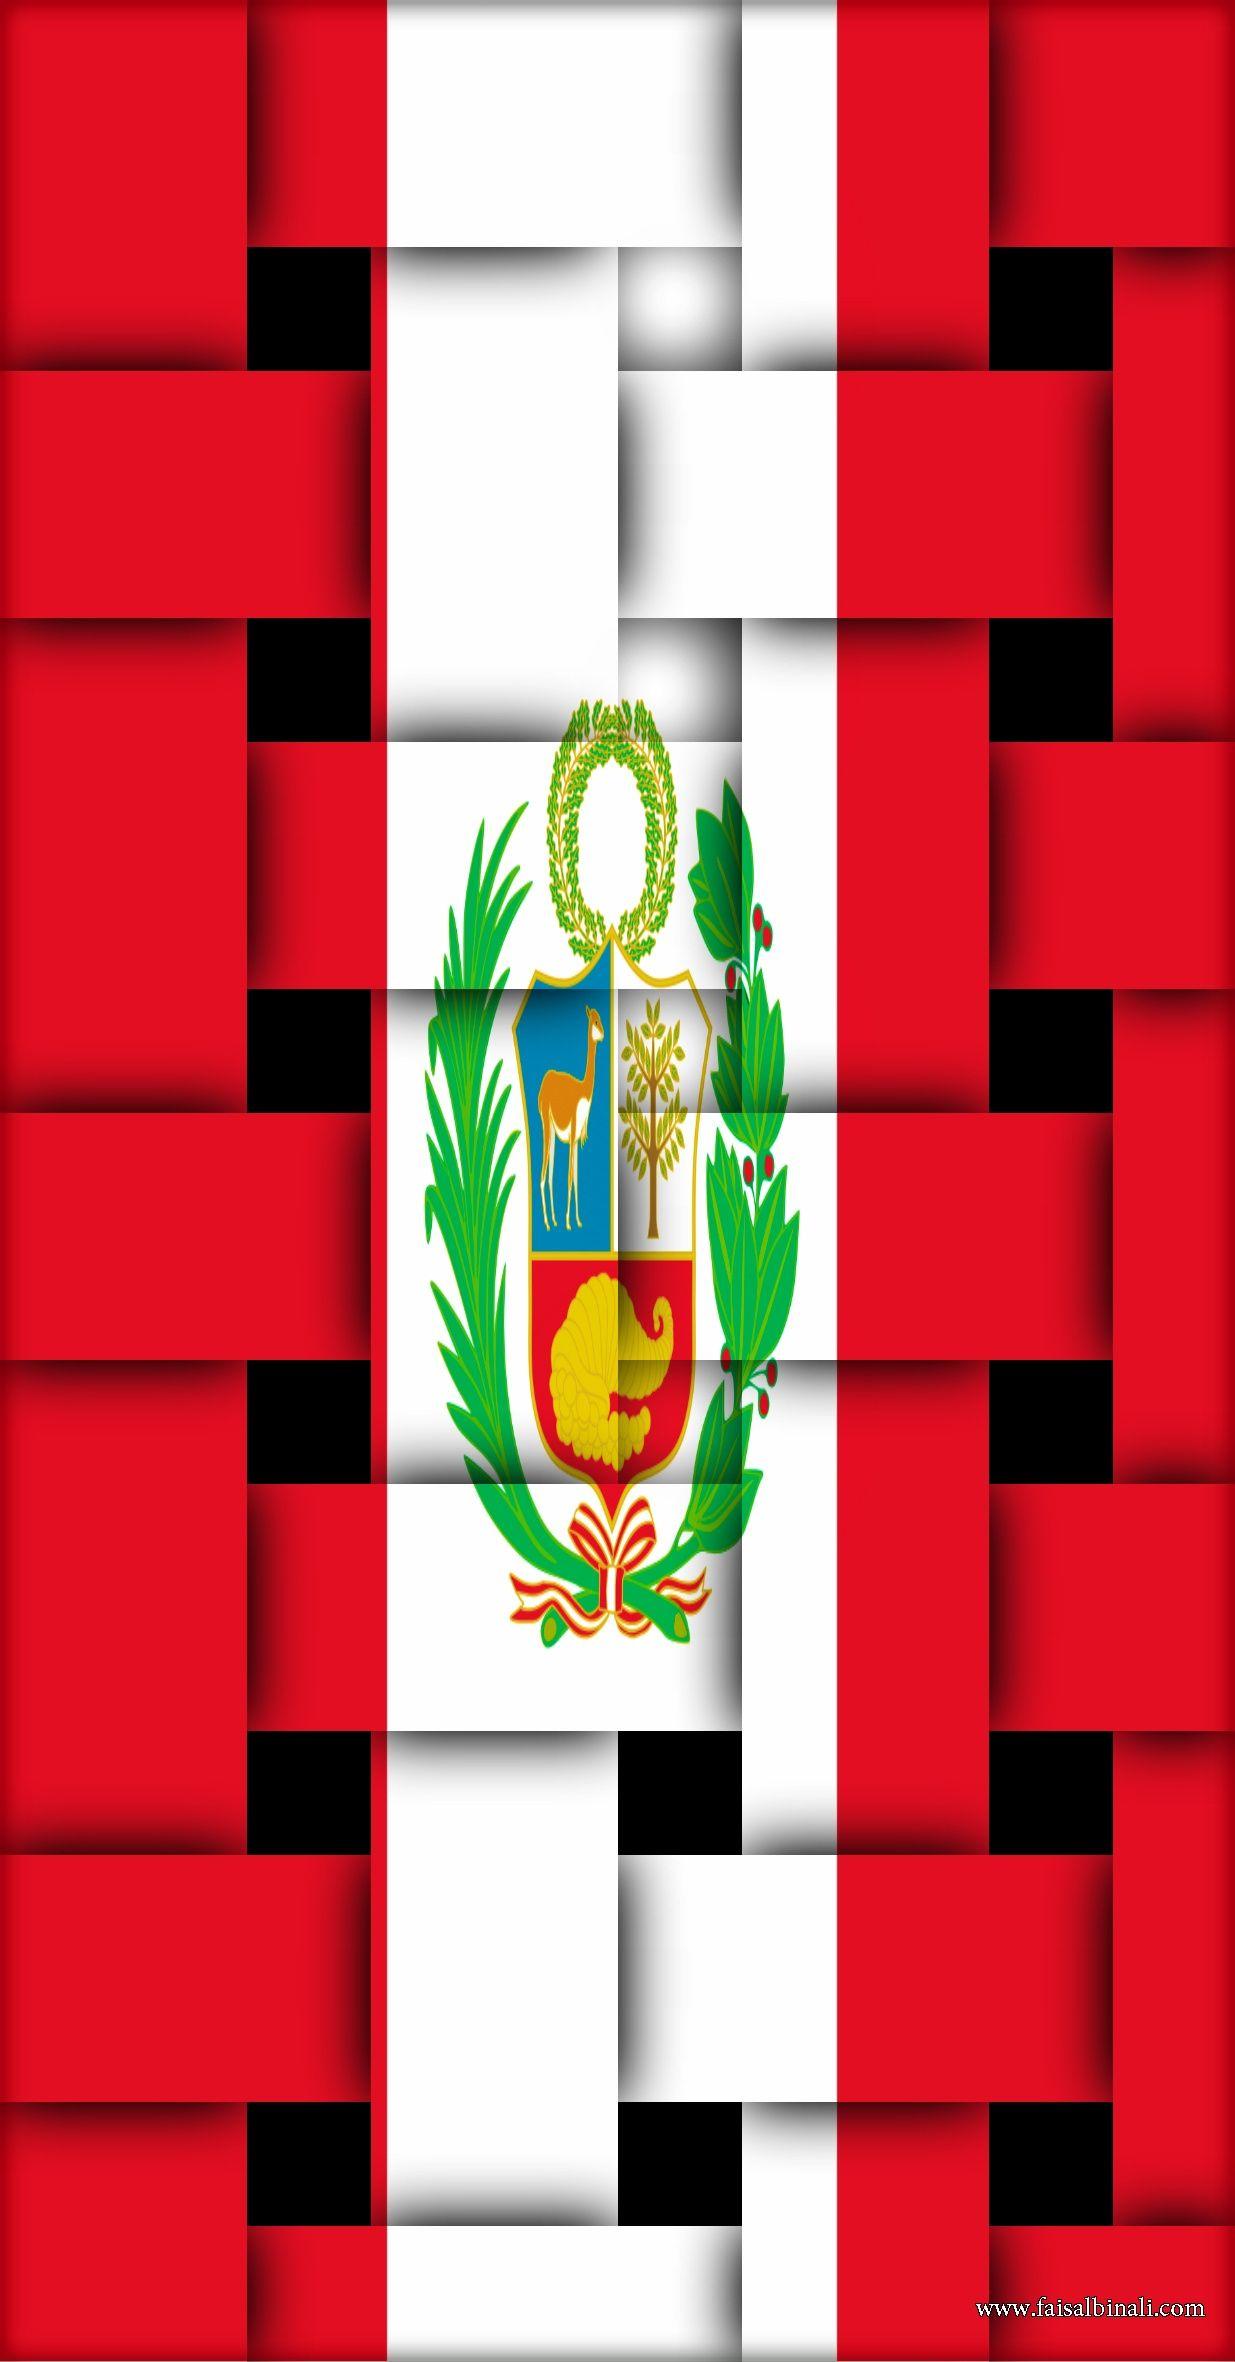 Peru Flag Hd Wallpapers For Smartphones And Tablets Wallpaper S Artwork Peru